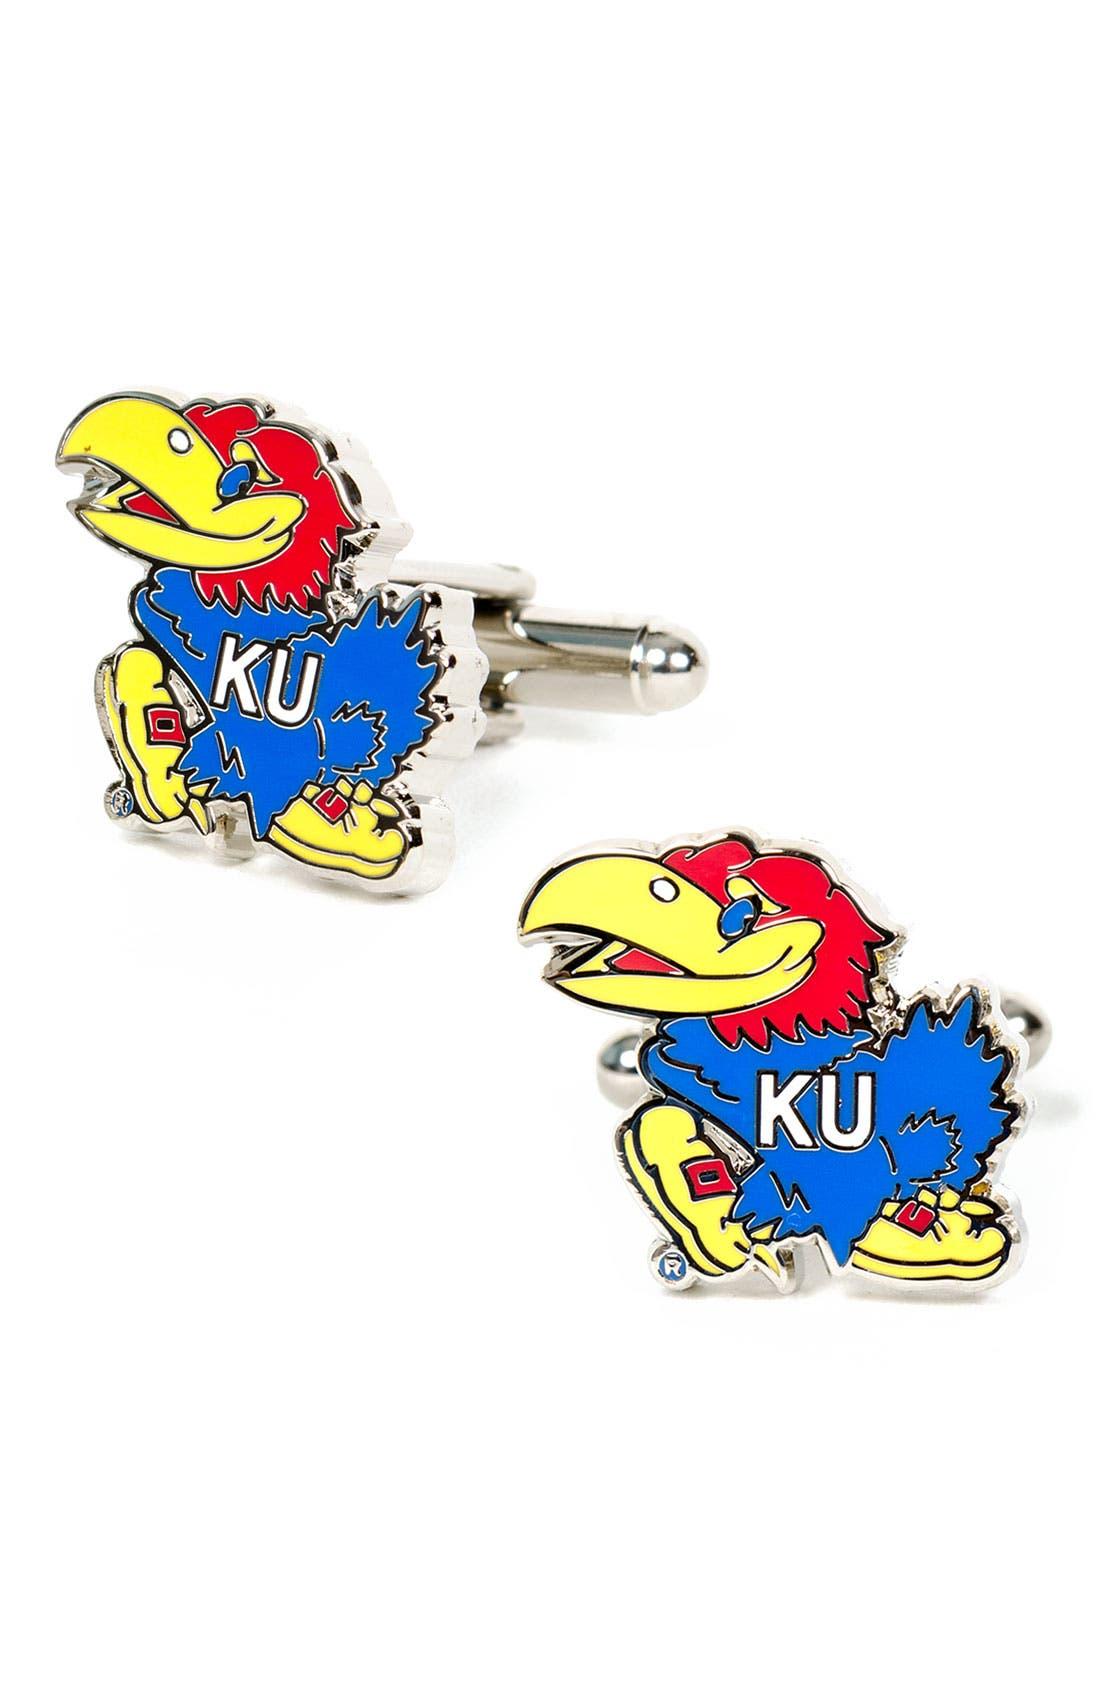 'Kansas Jayhawks' Cuff Links,                             Main thumbnail 1, color,                             Blue/ Red/ Gold